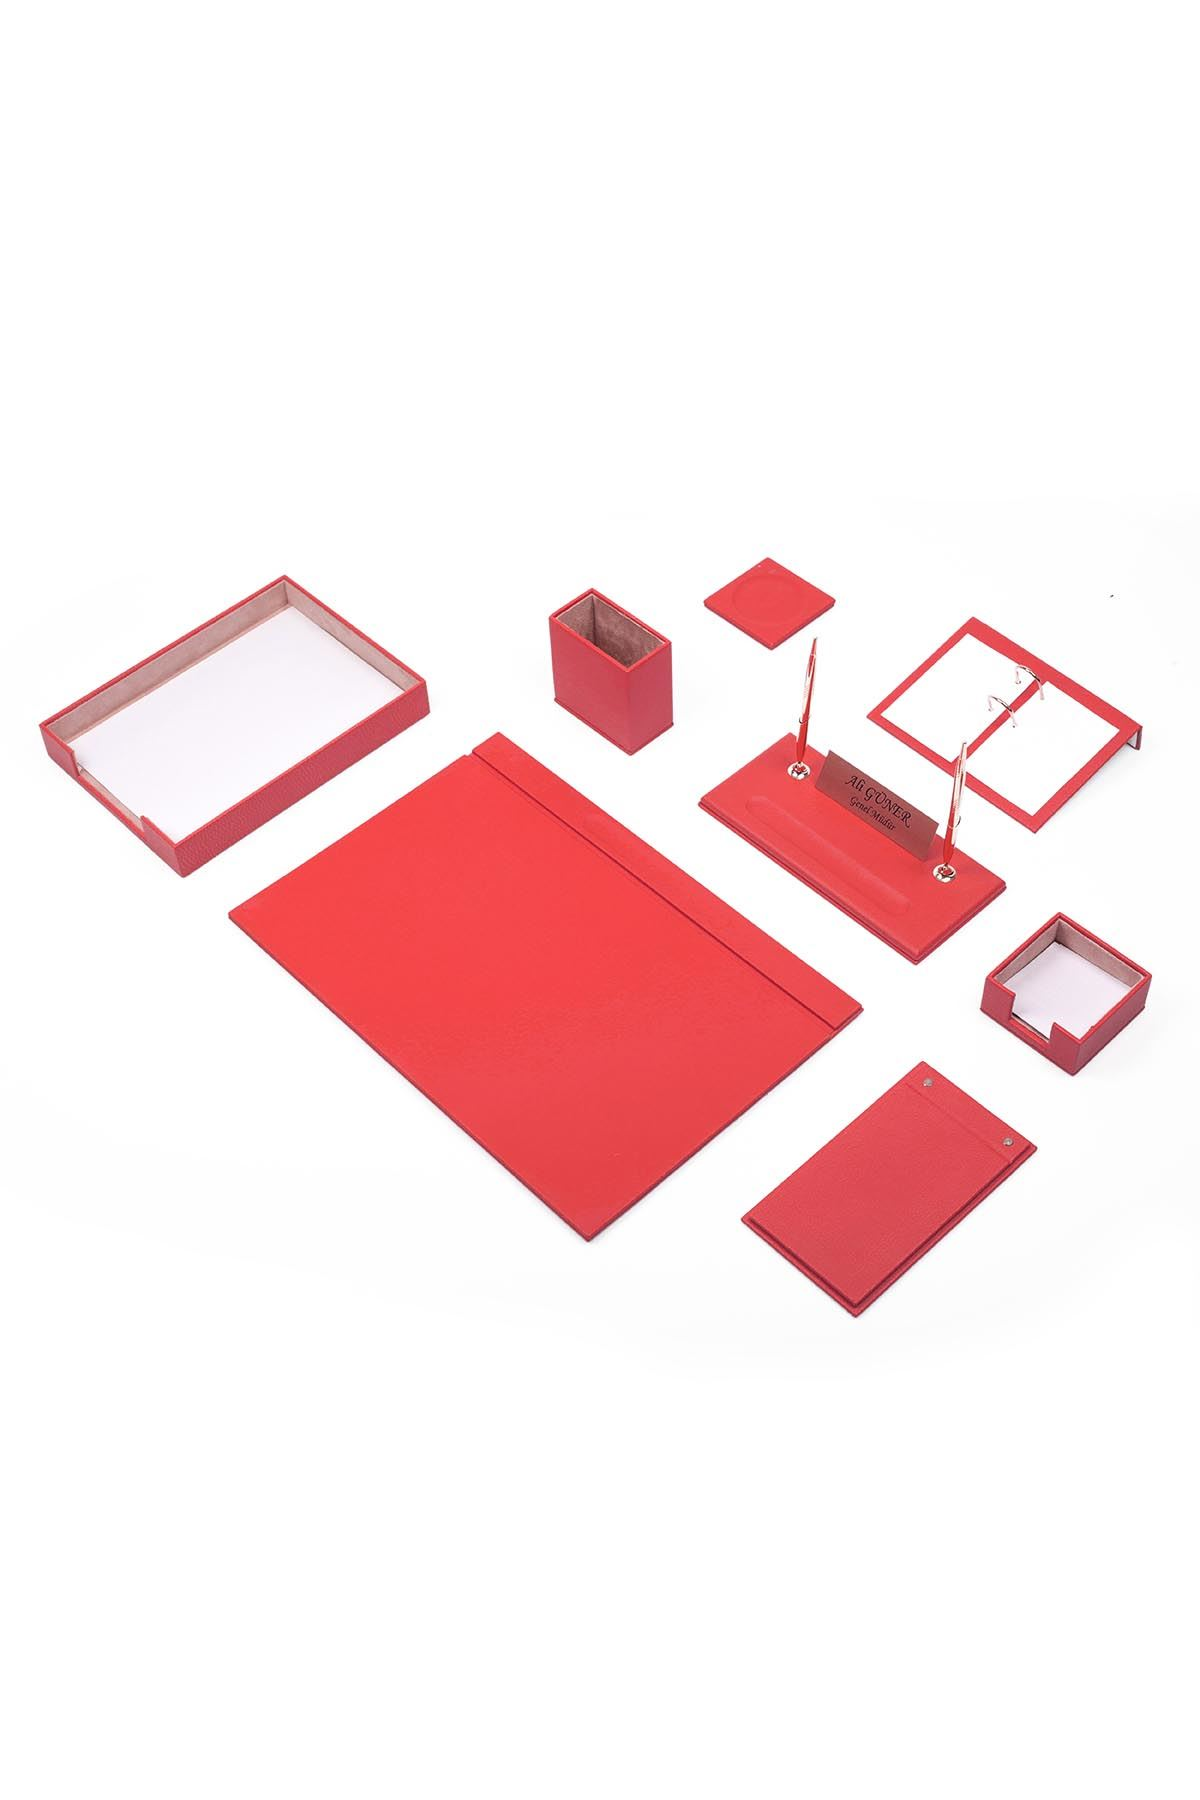 Leather Desk Organizer 10 Accessories Red